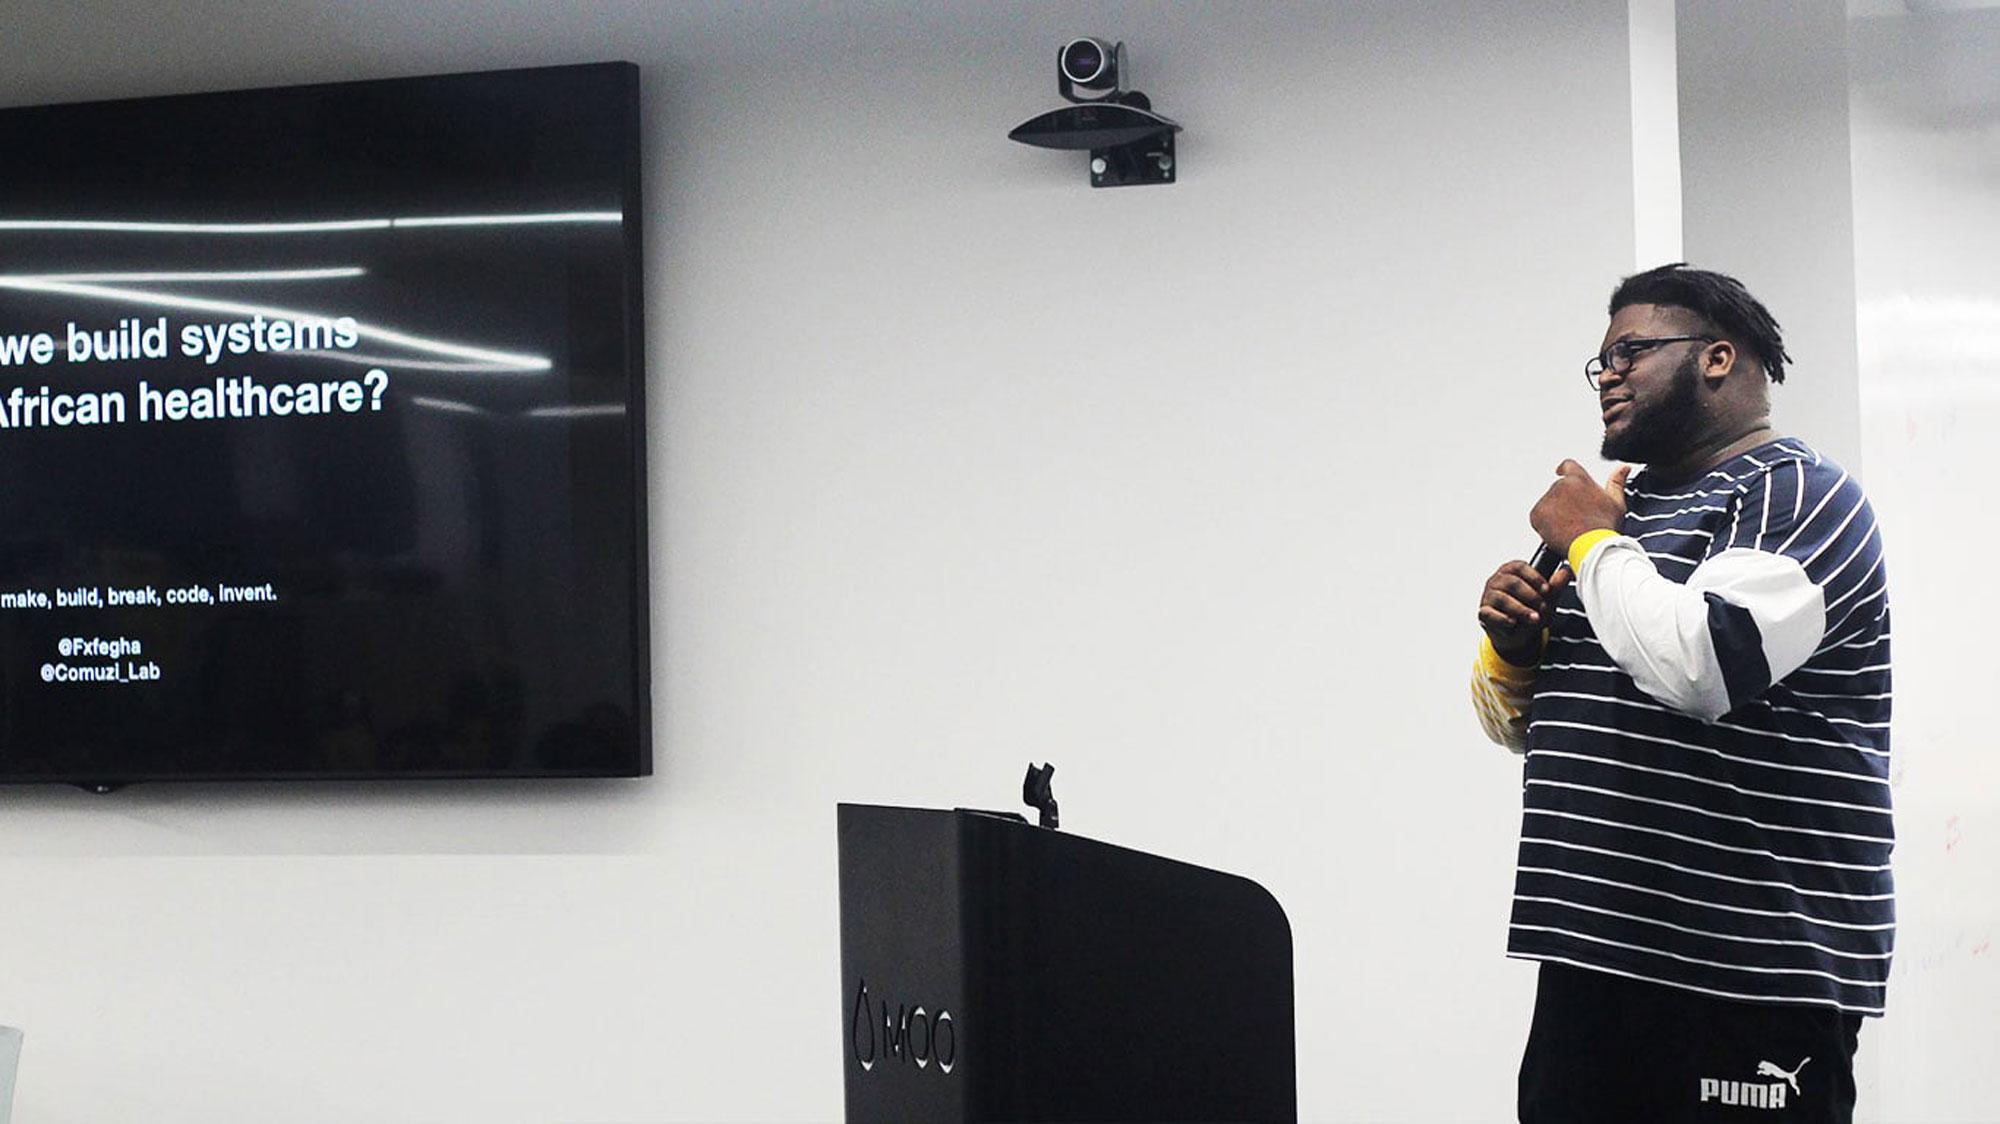 Alex Fefegha speaking at event